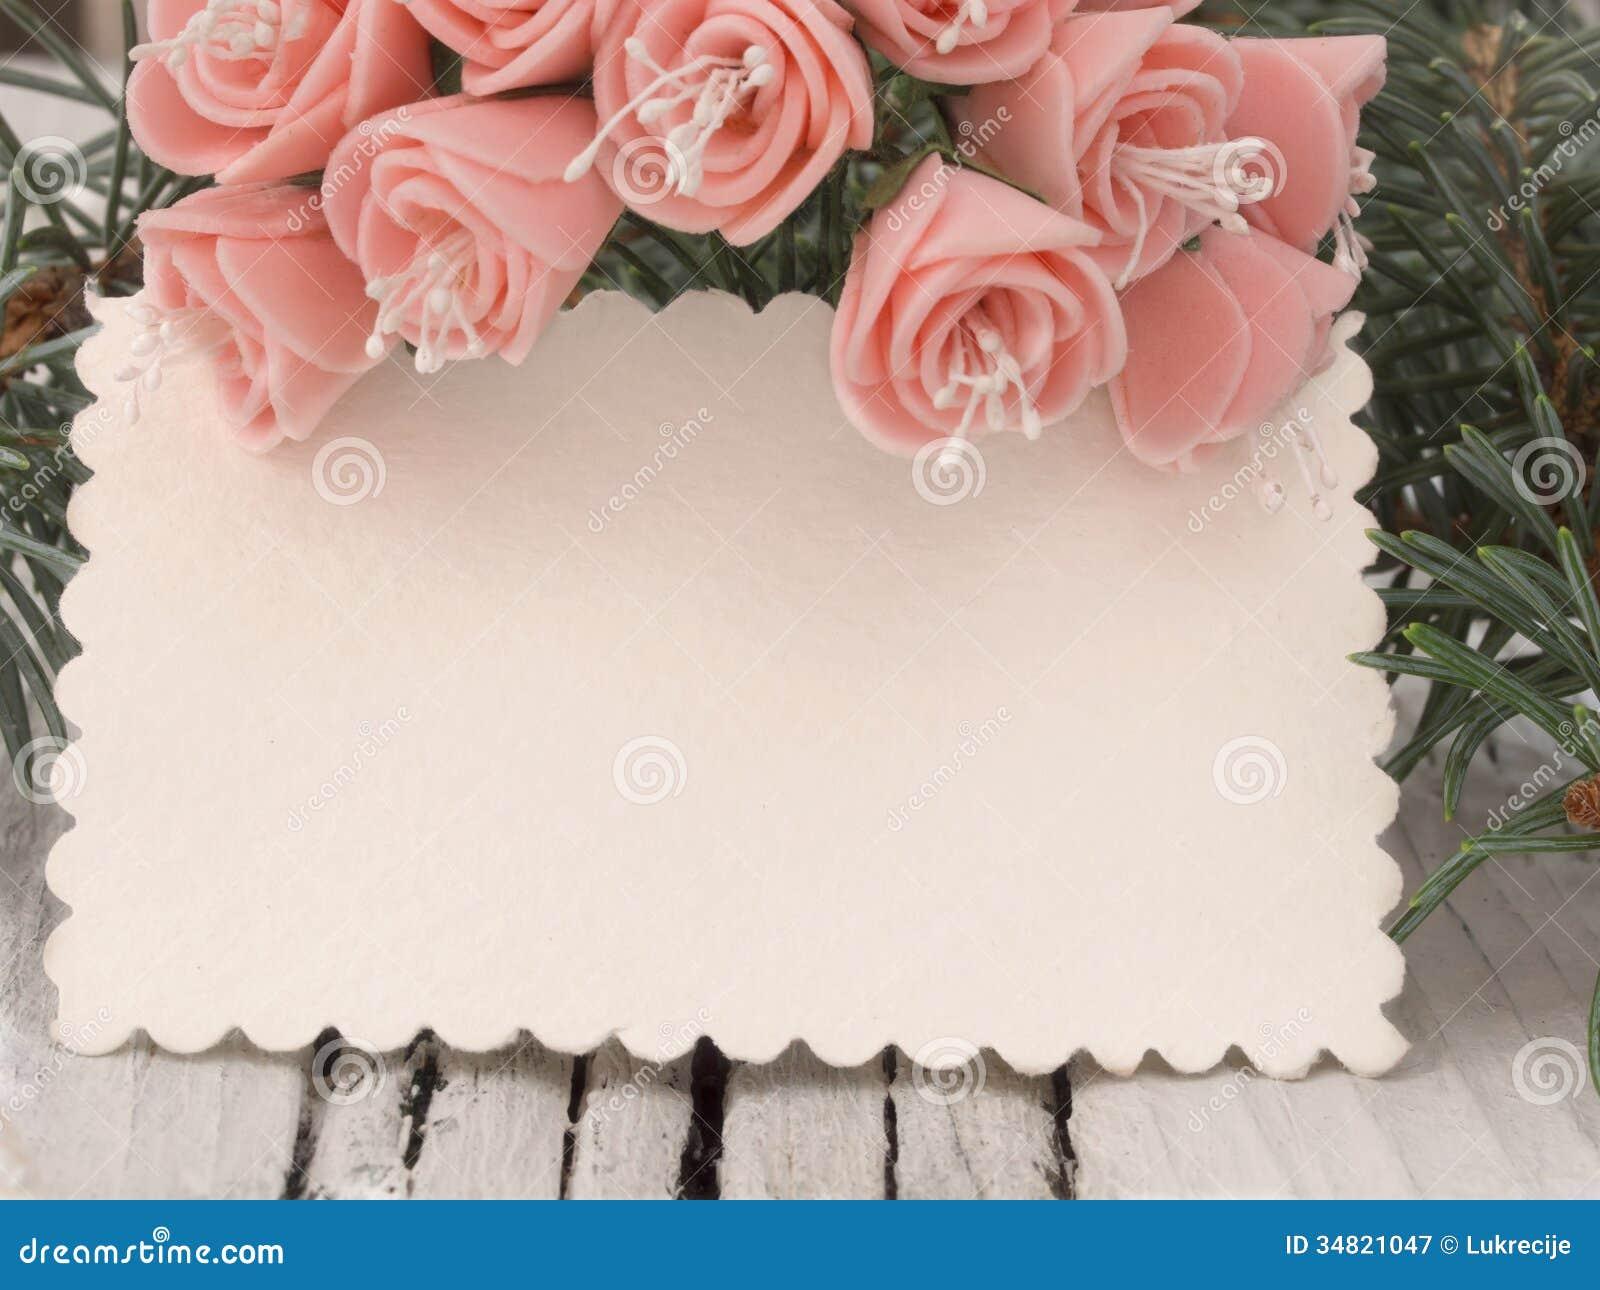 Wedding Card Royalty Free Stock Photography - Image: 34821047